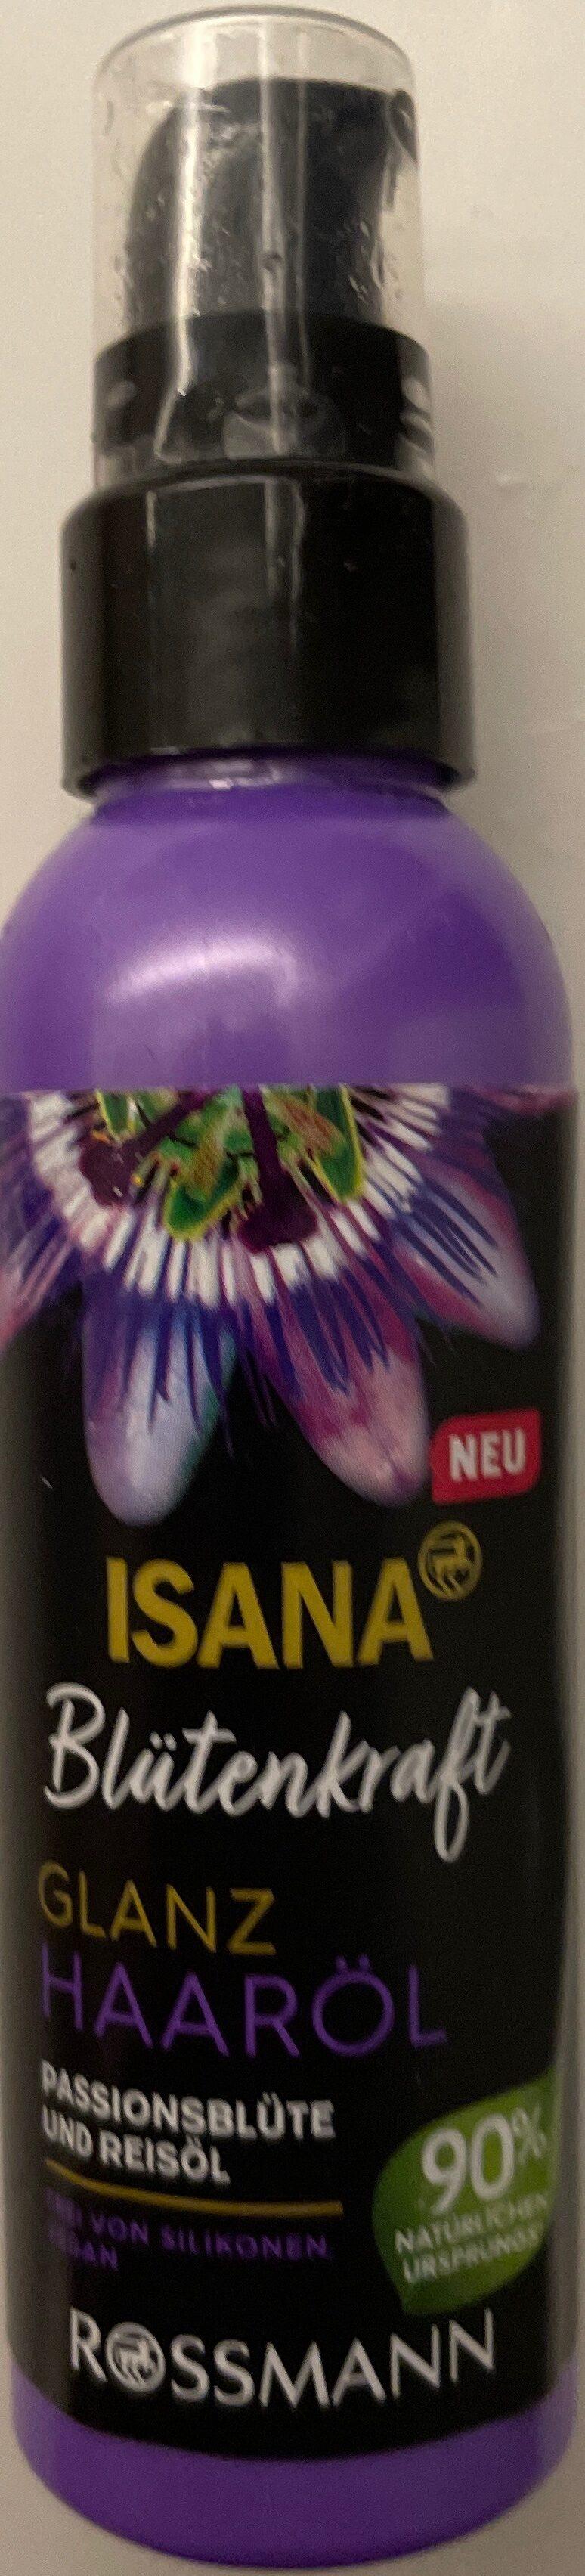 Glanzhaaröl - Product - de